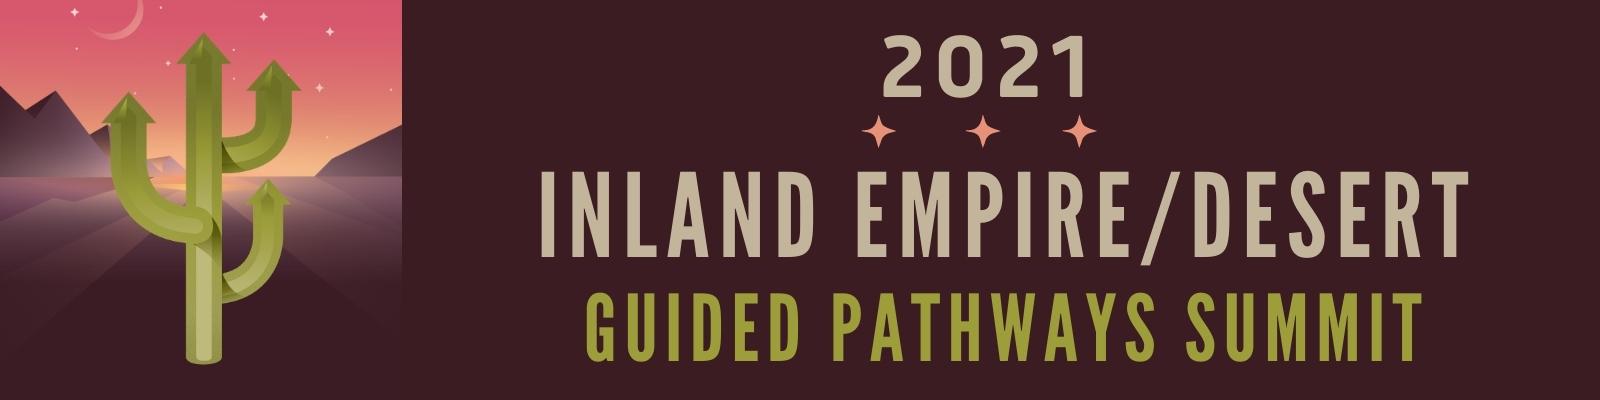 Inland Empire Guided Pathways 2021 Summit Banner